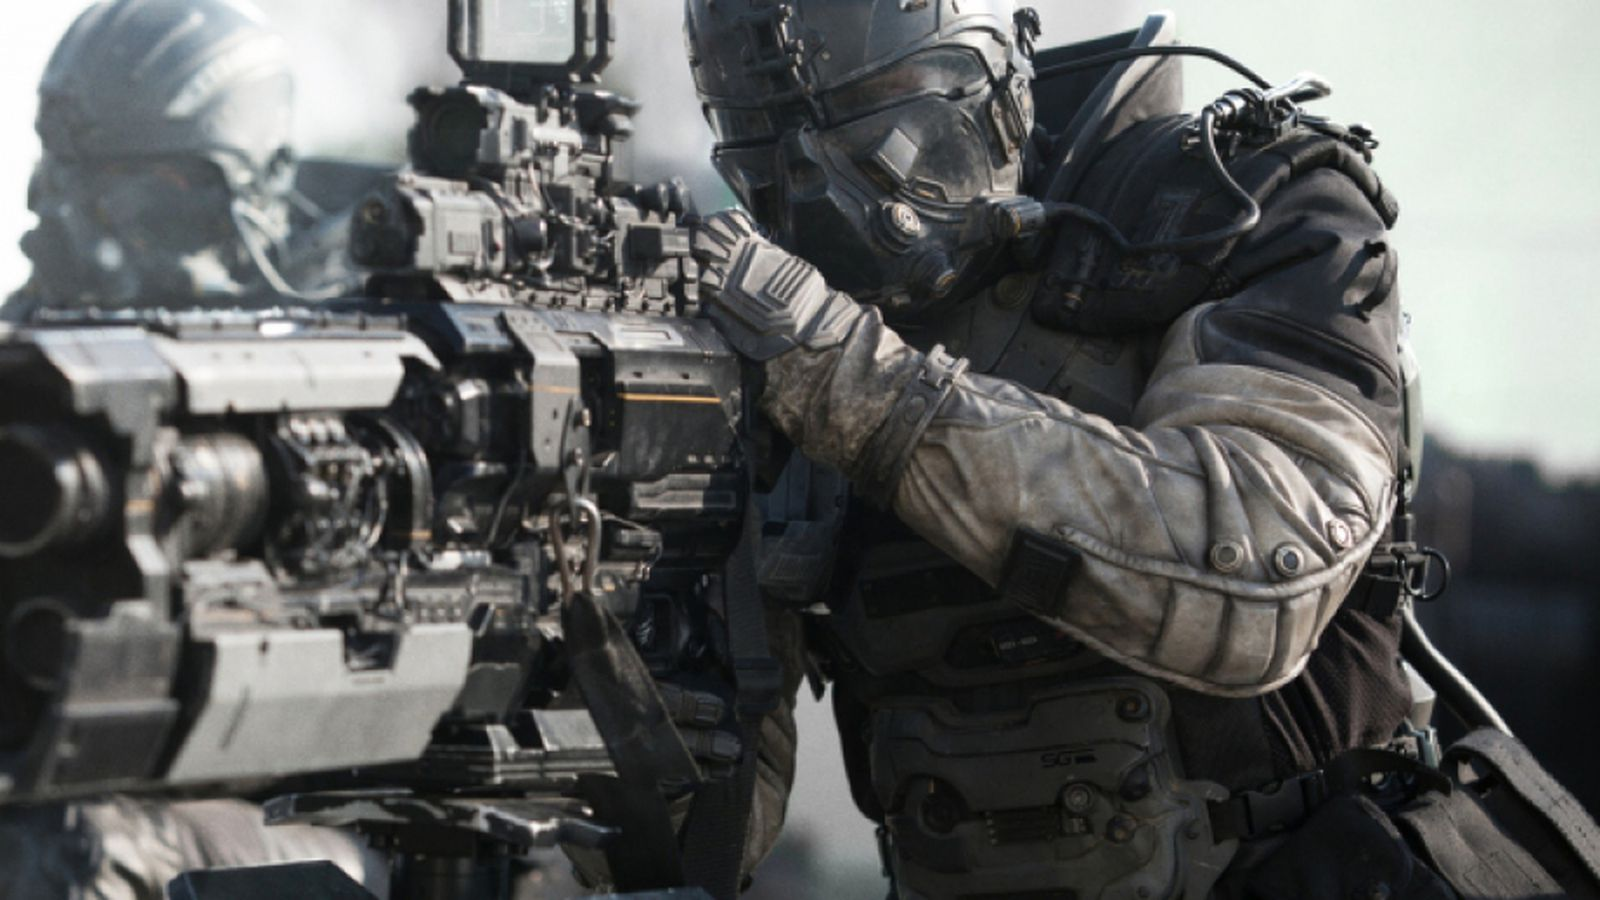 Spec Ops Wallpaper Hd Spectral Review Netflix S New Movie Is Gears Of War Meets